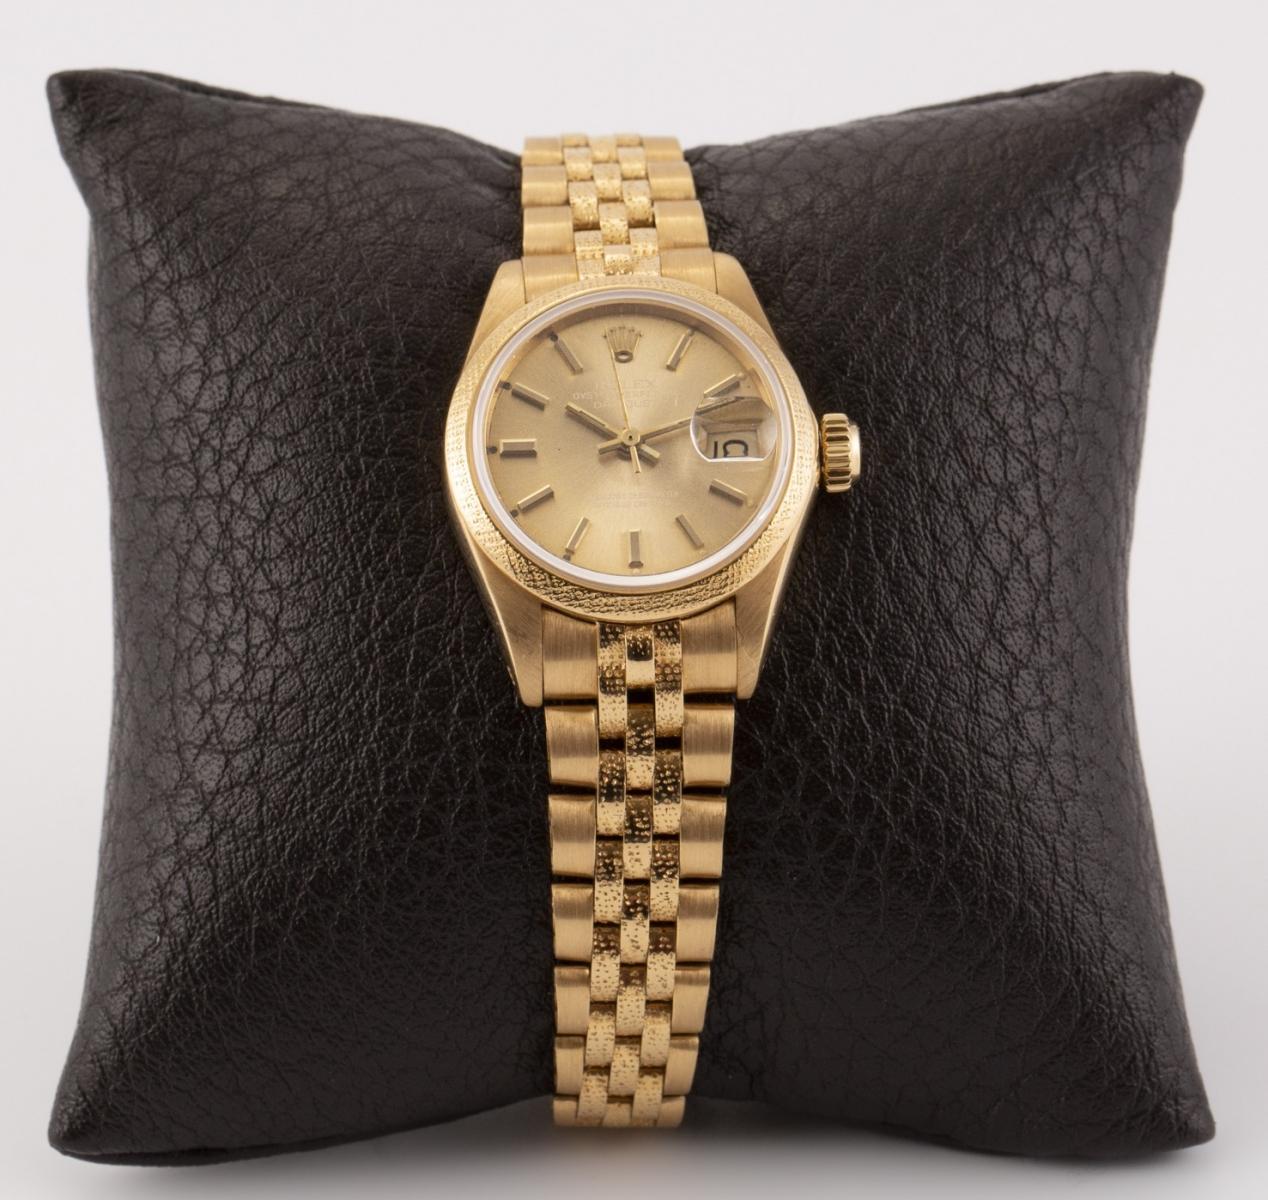 130 - ROLEX. Montre de dame en or jaune Oyster perpetual datejust, bracelet Jubilé Ecorce. Adjugé 5002€